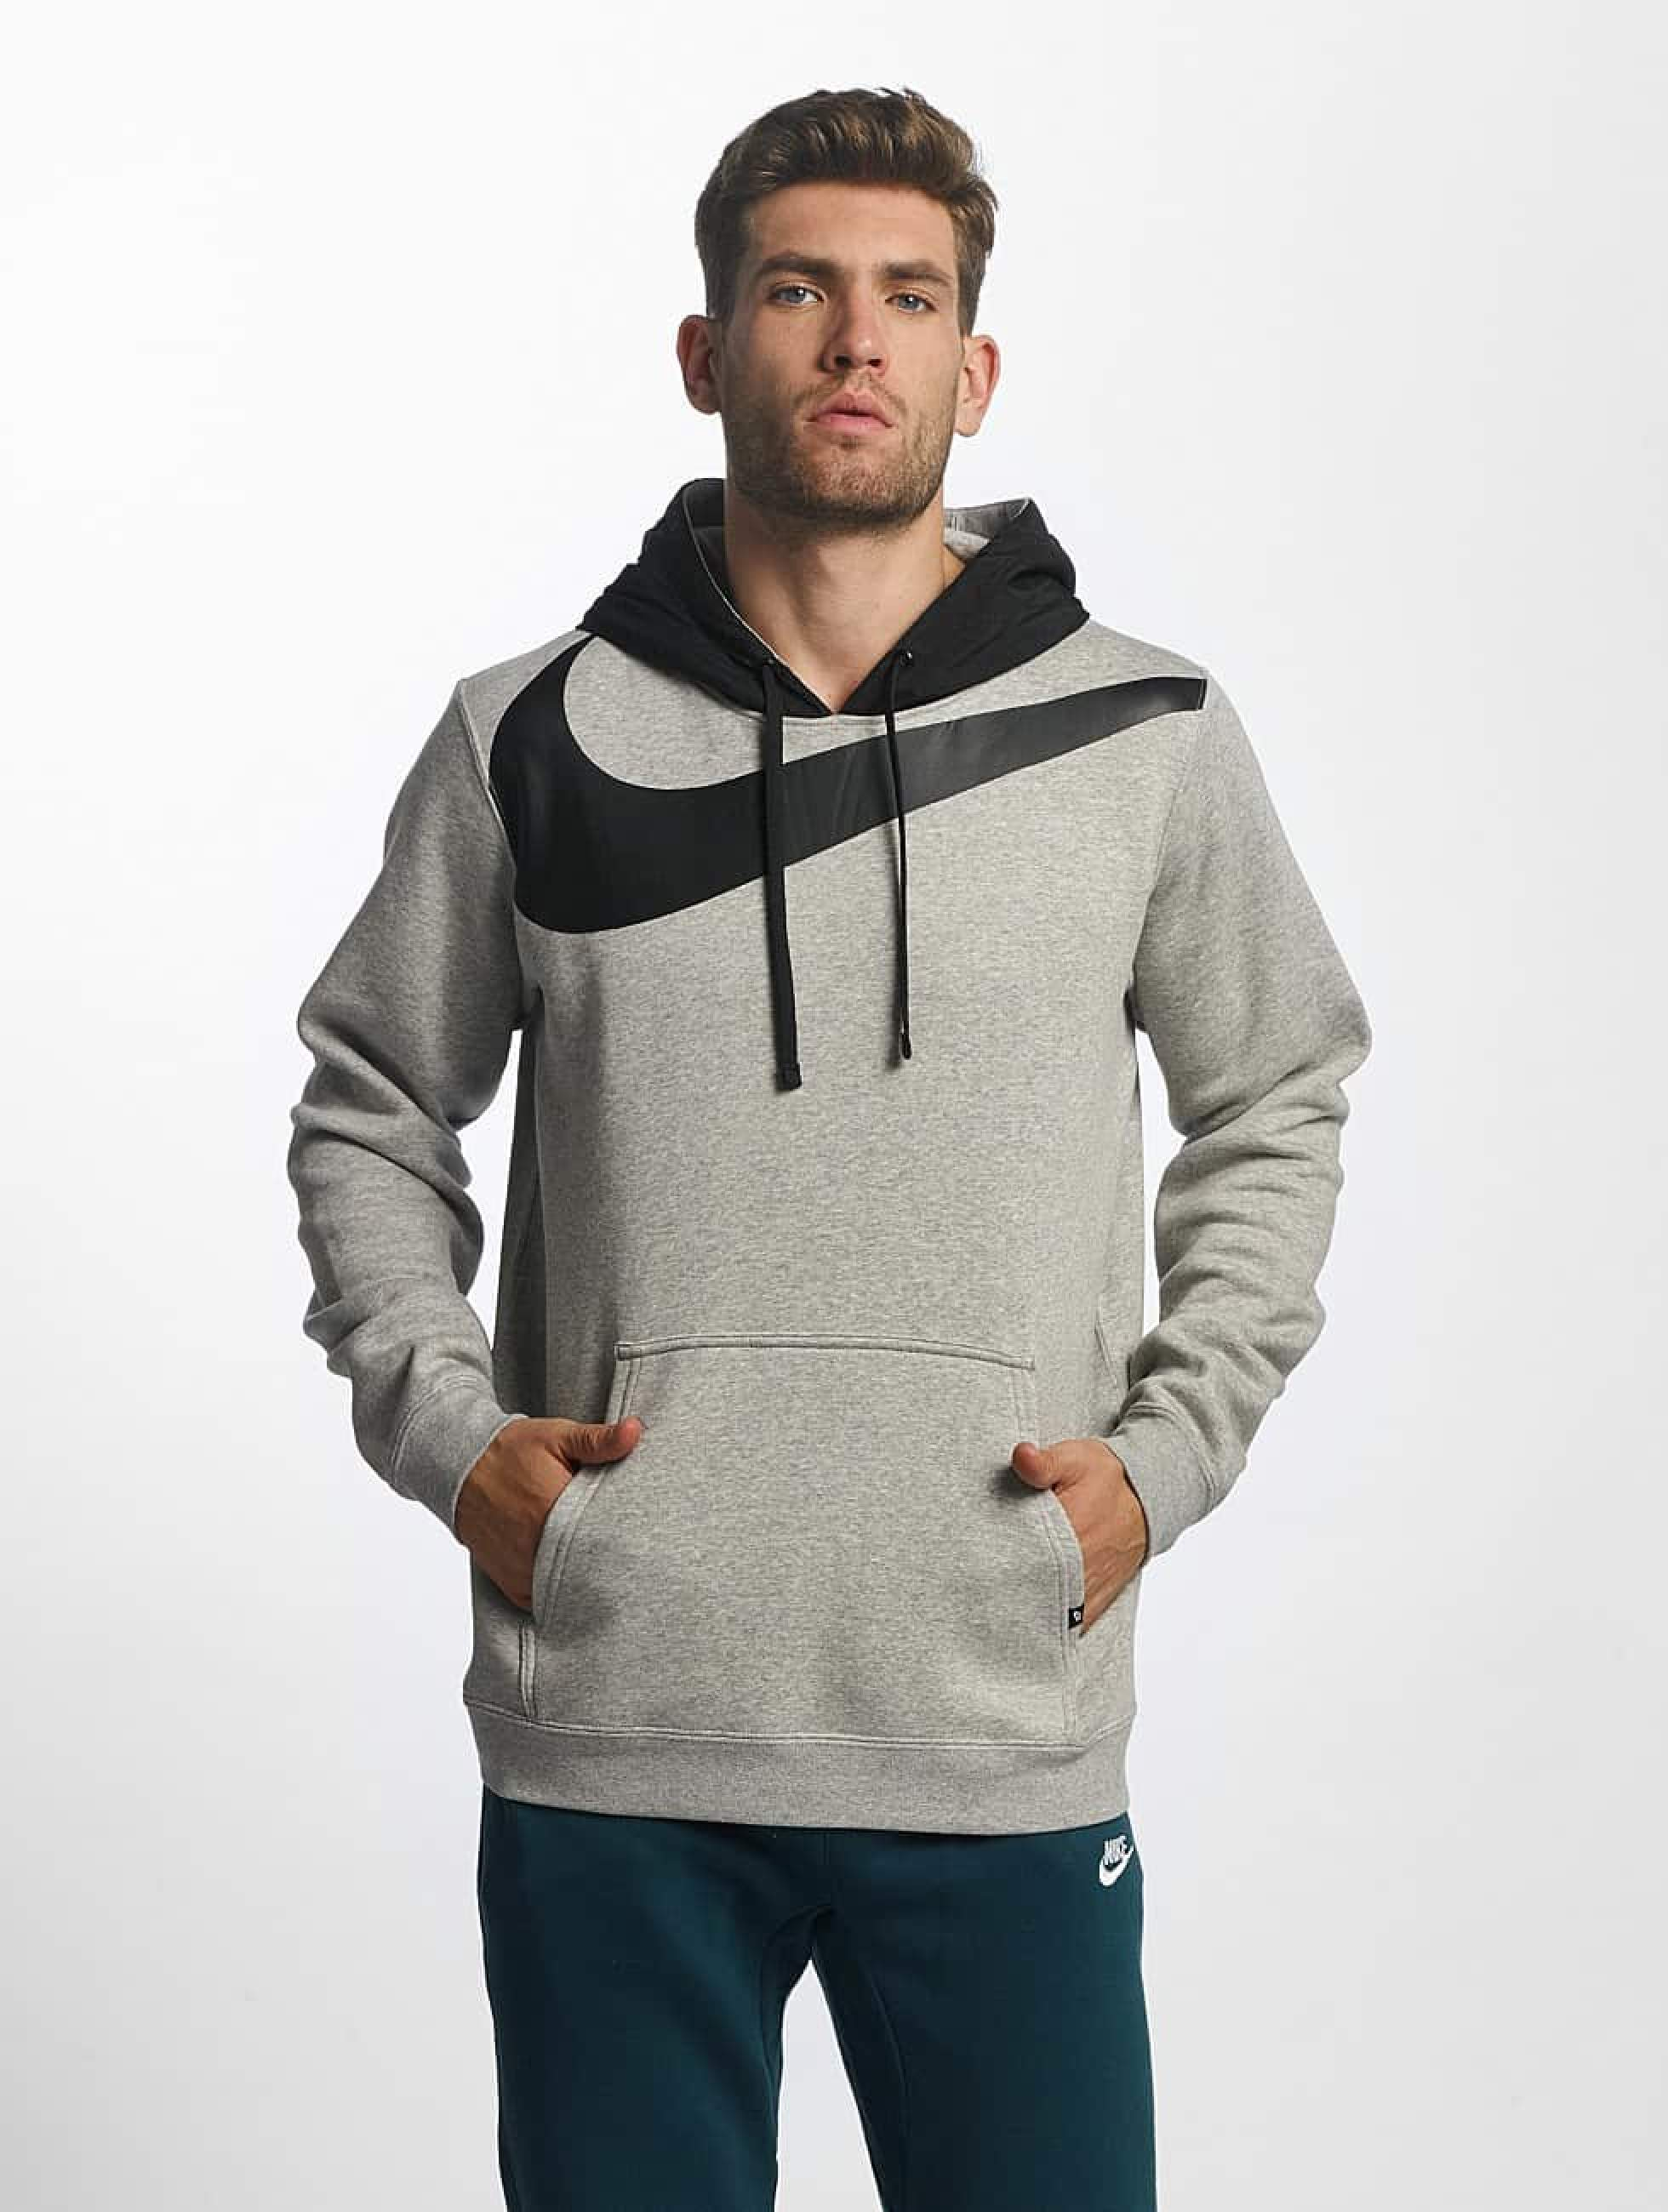 fa6366bdf19f1 Sweater und Hoodies bei Sportiply